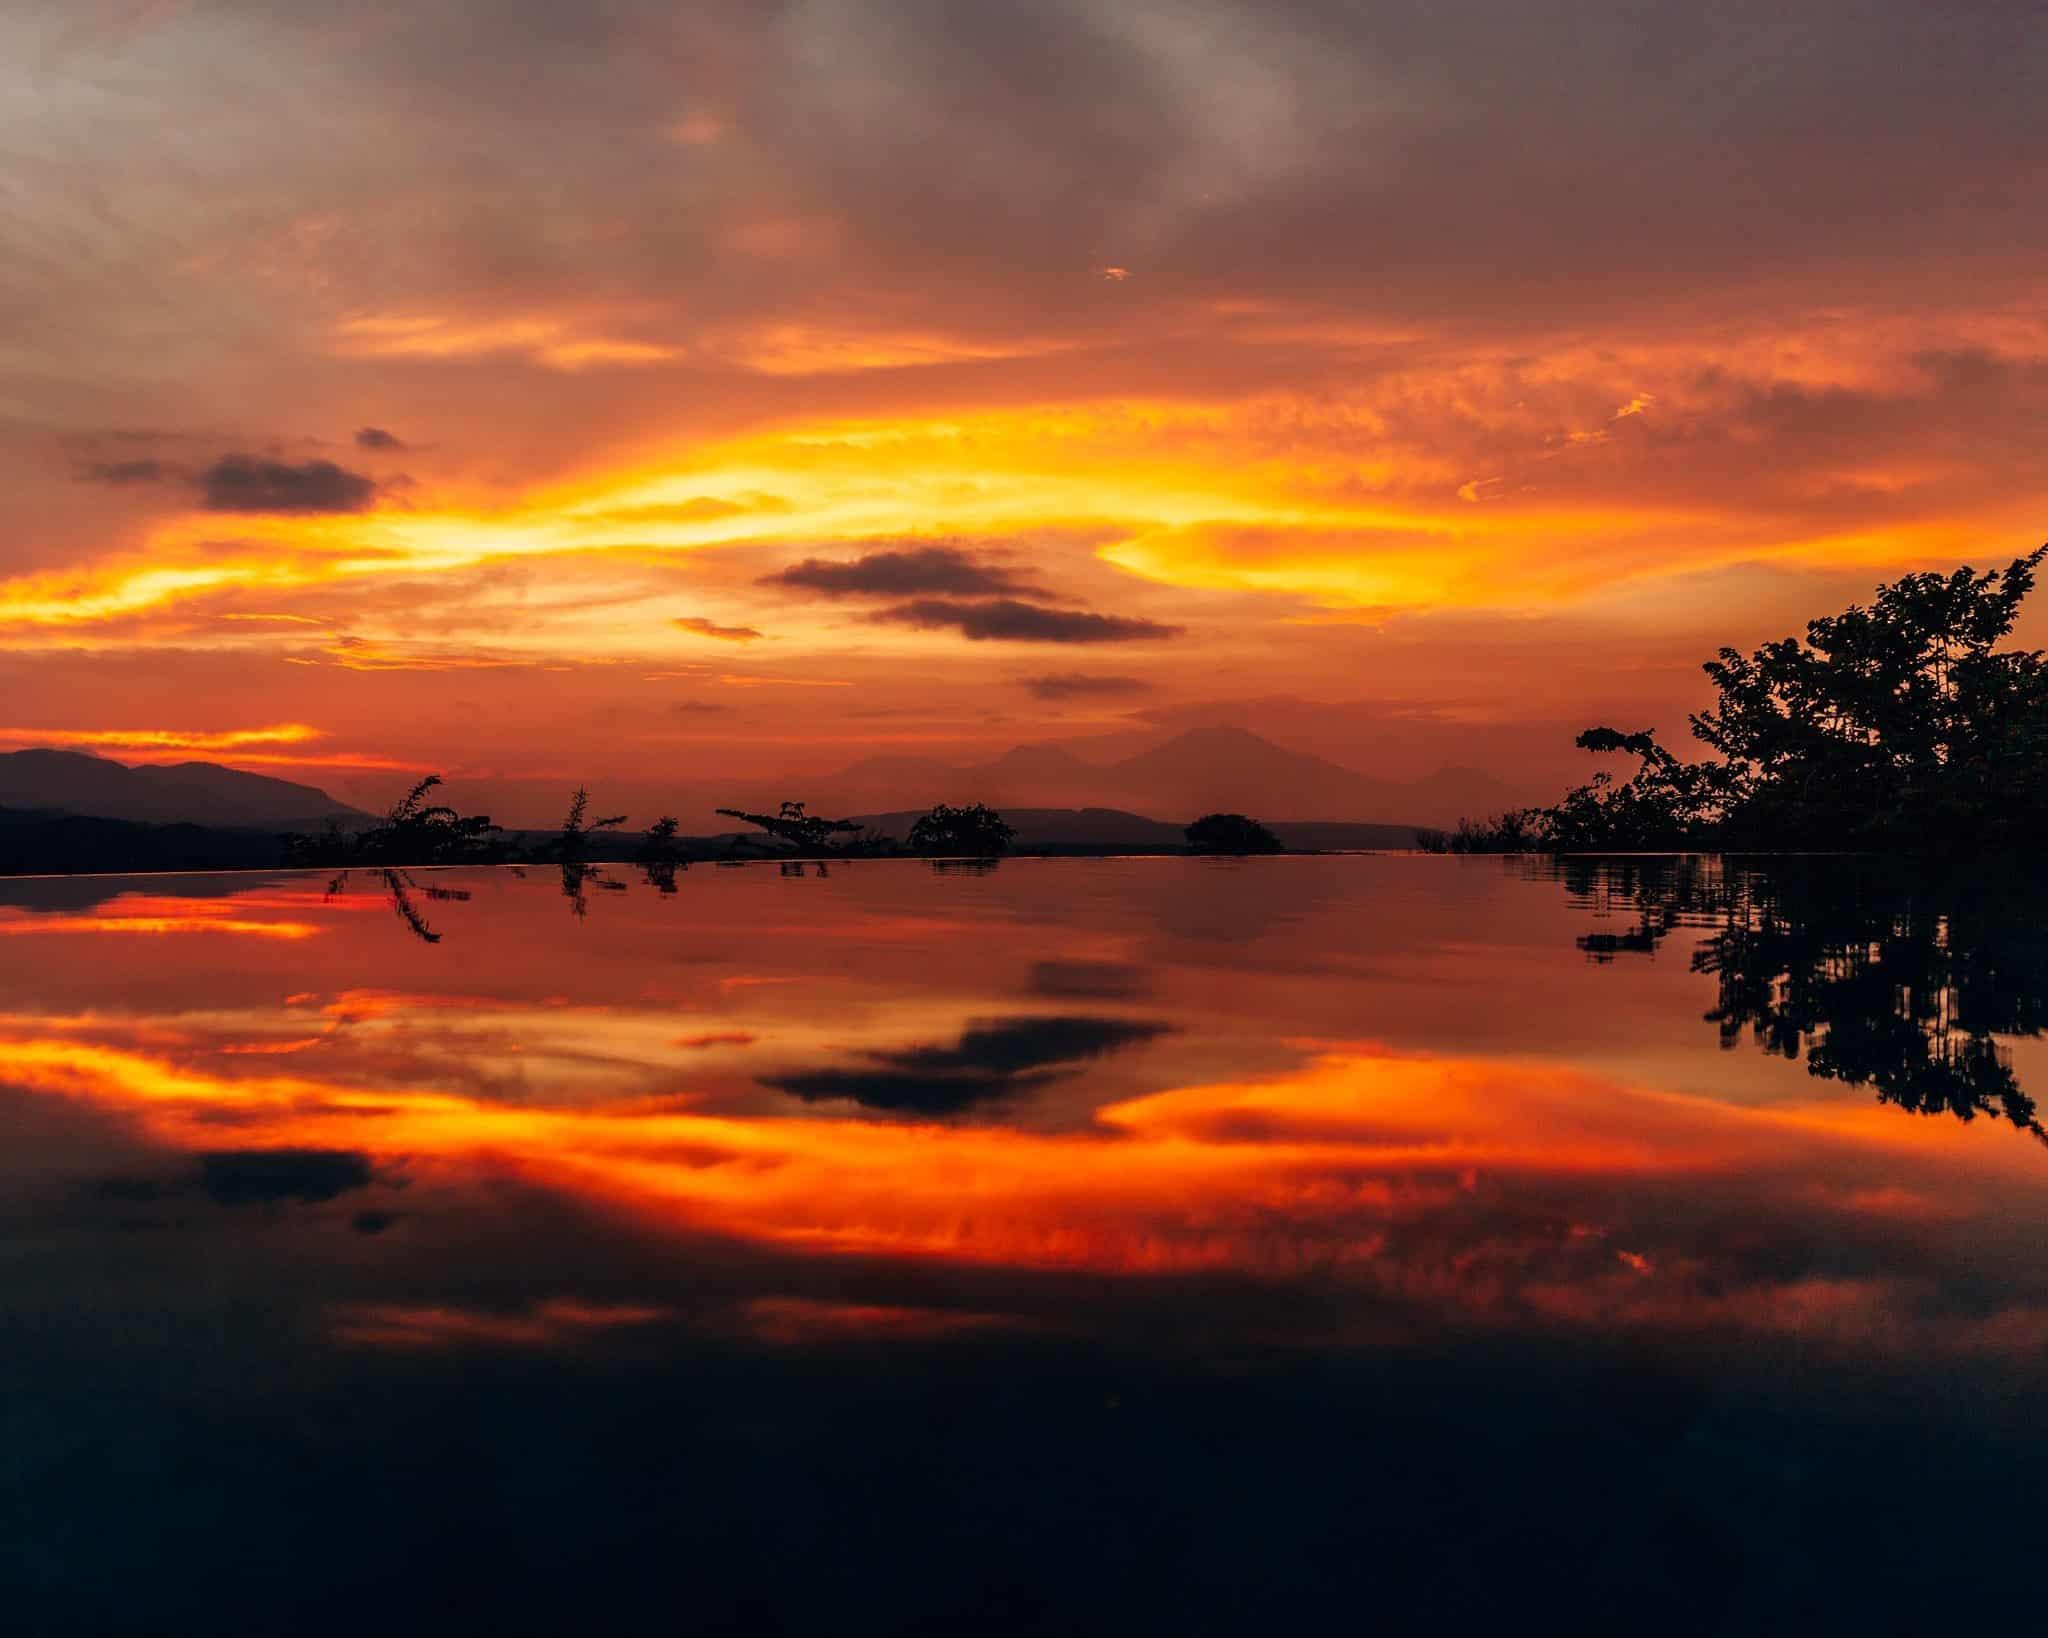 Bright Red Sunset at Sumberkima Hill, Bali - The Next Trip